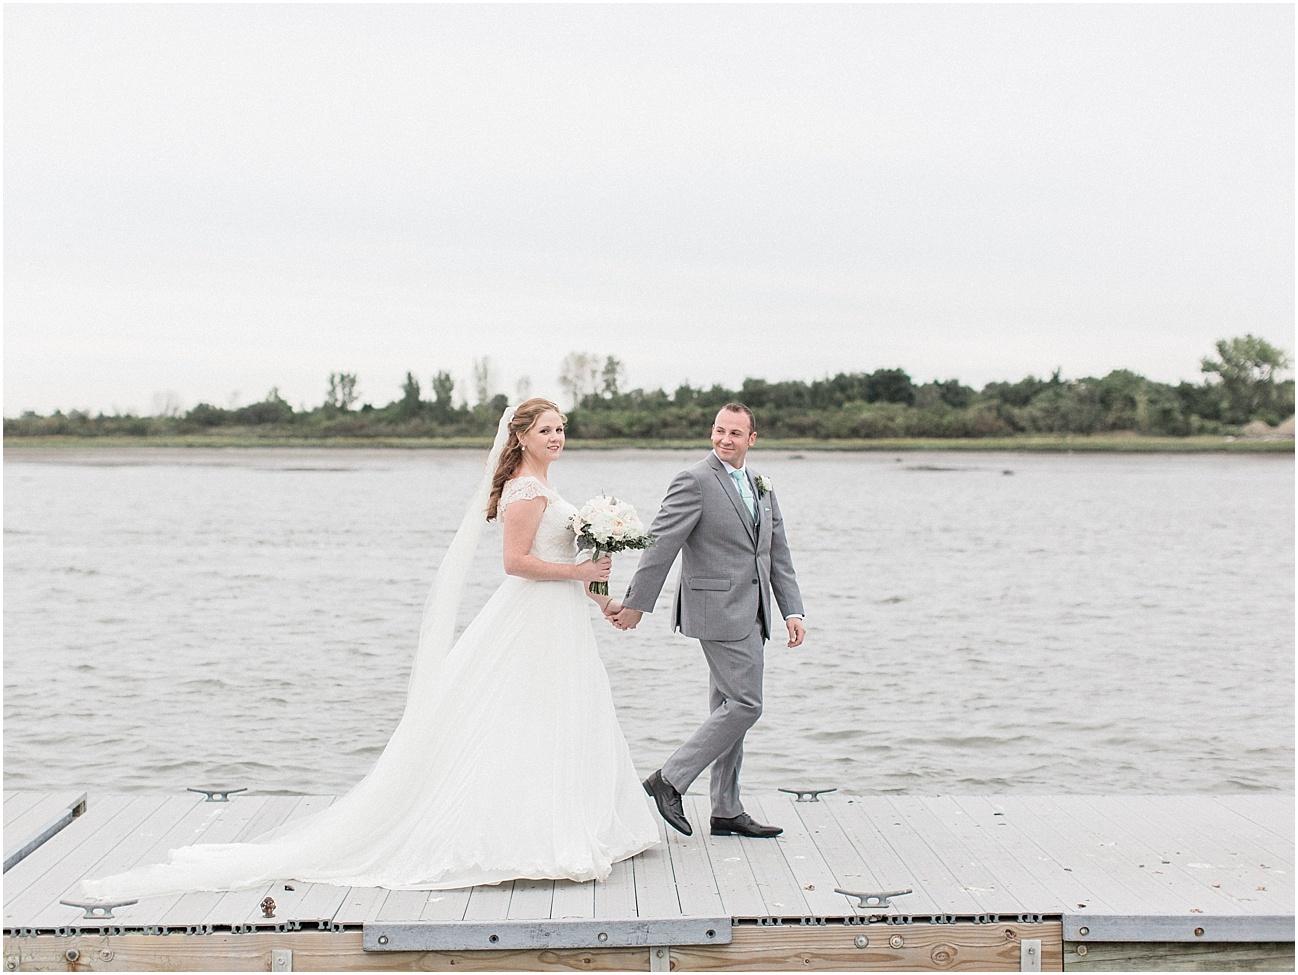 jaclyn_adam_st_ann_brendans_dorchester_southie_castle_bride_groom_venezia_waterfront__cape_cod_boston_wedding_photographer_meredith_jane_photography_photo_0911.jpg